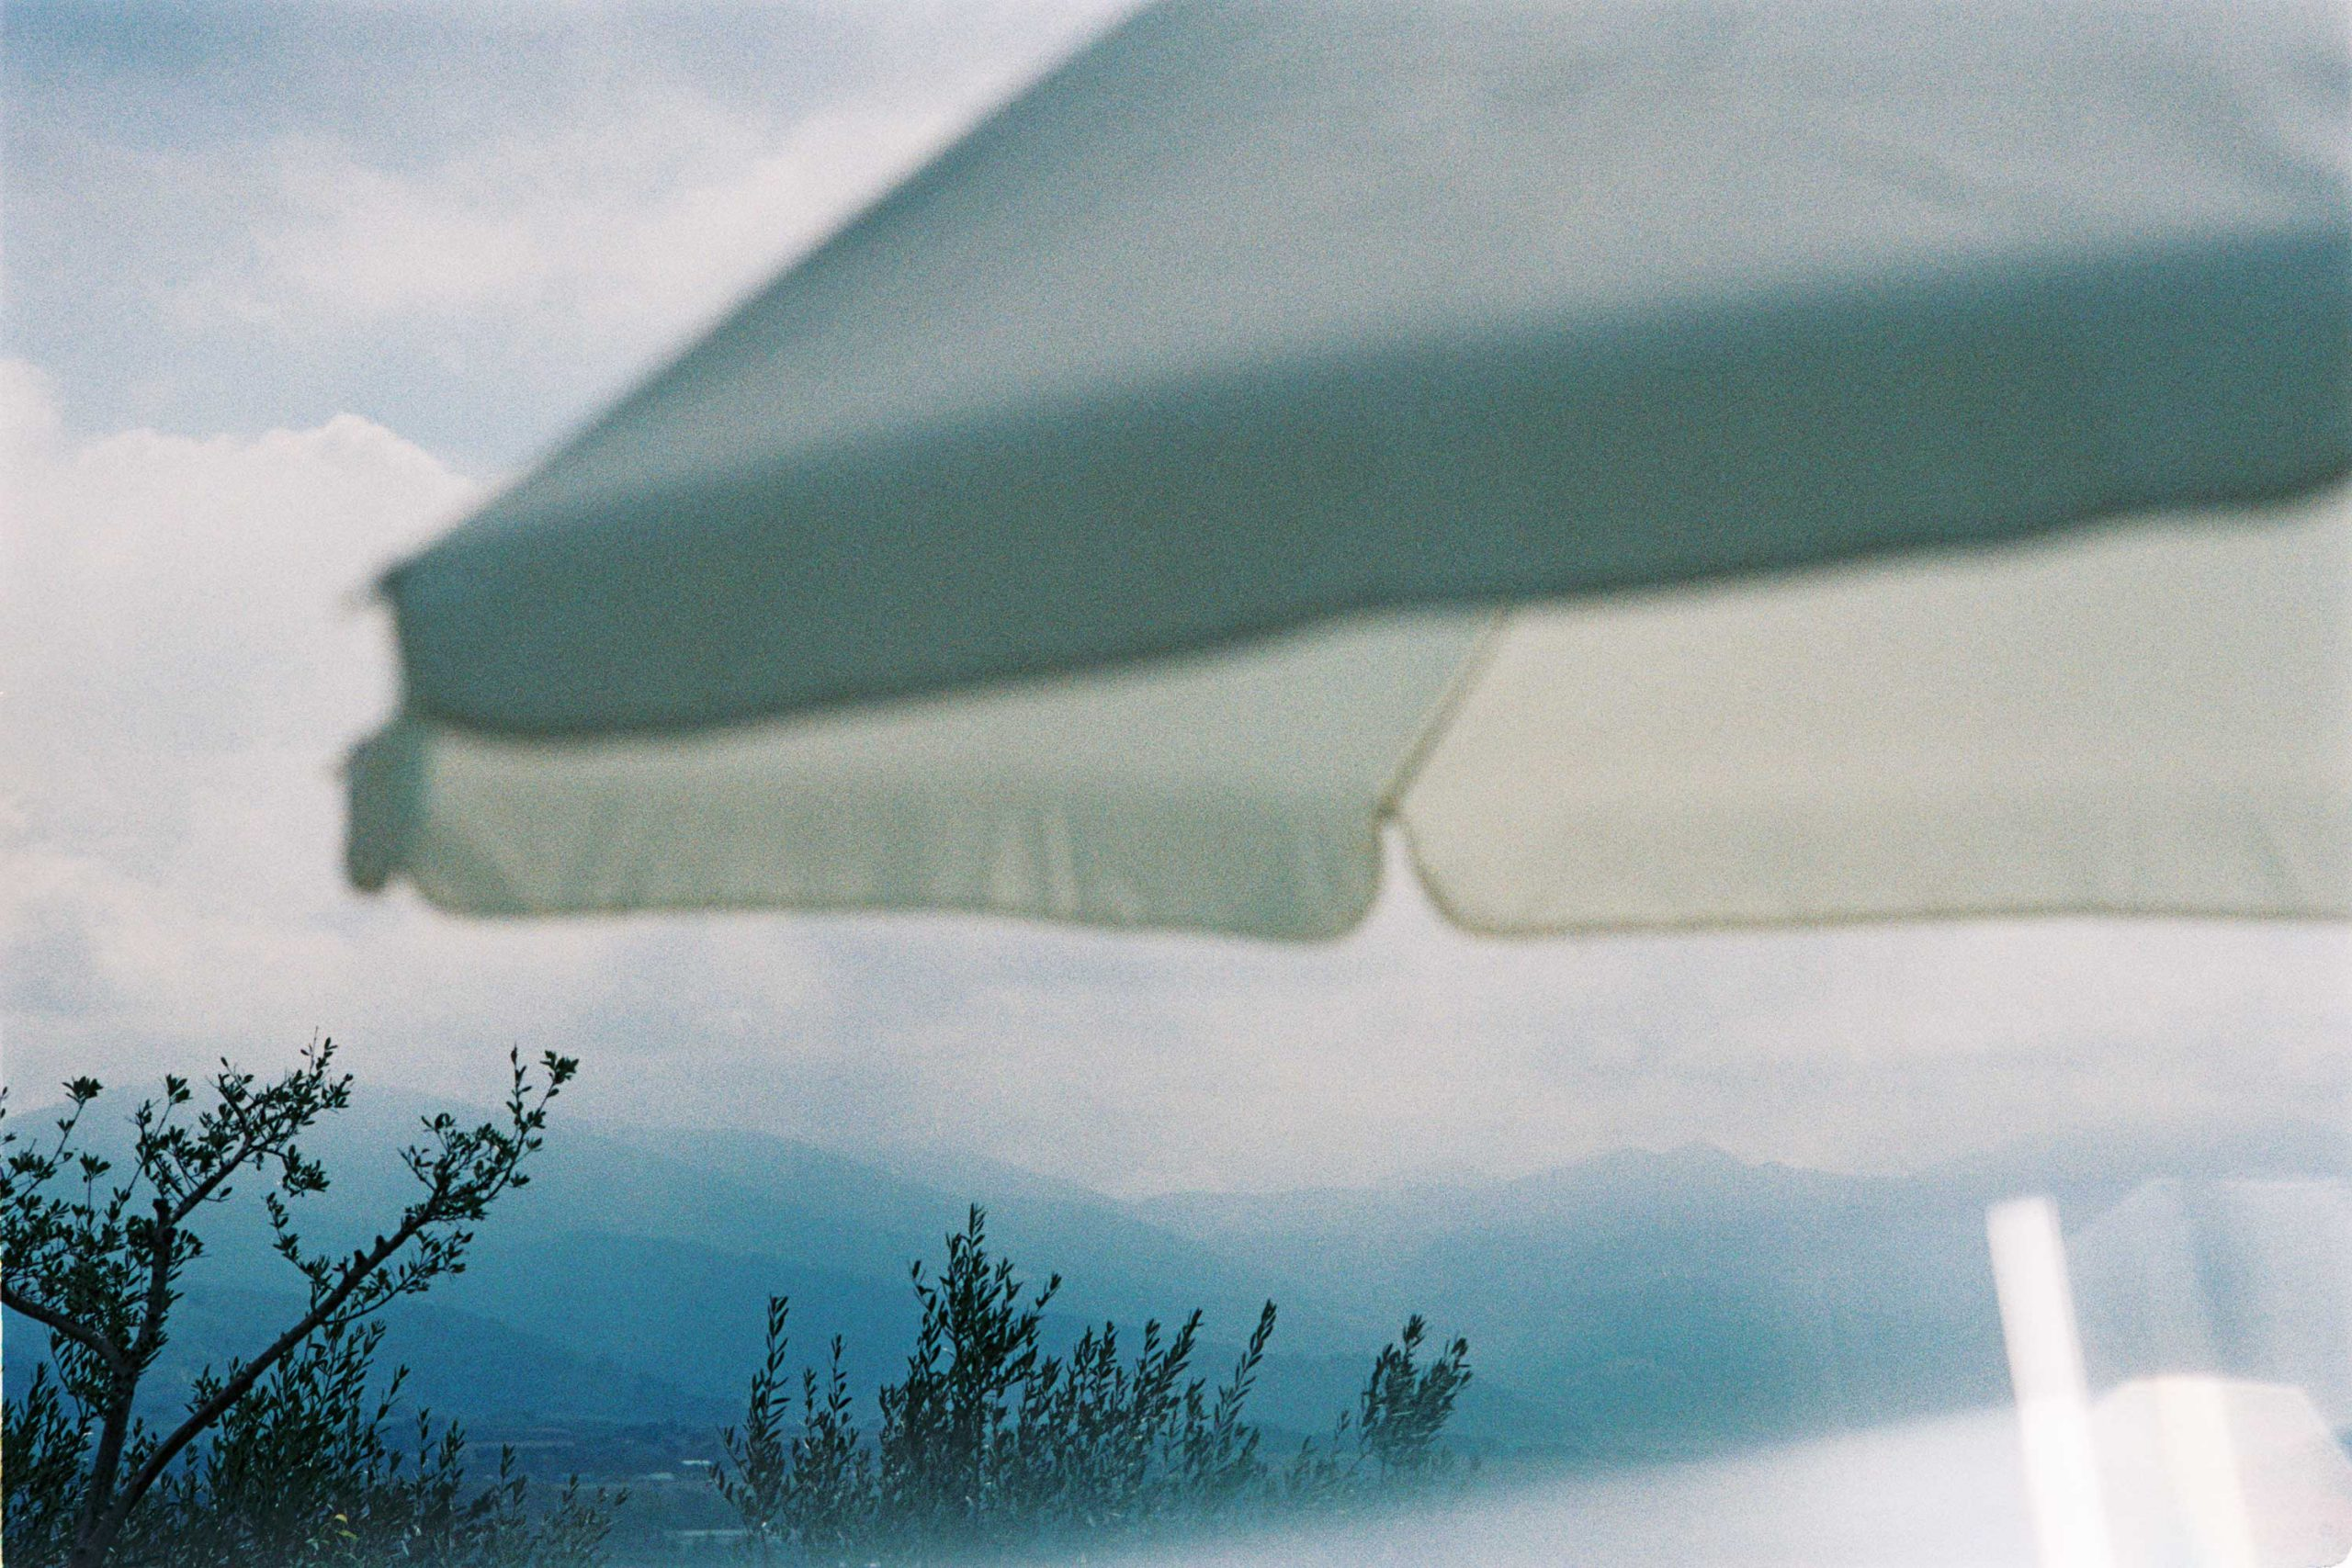 wren-agency-marcus-palmqvist-spaces15